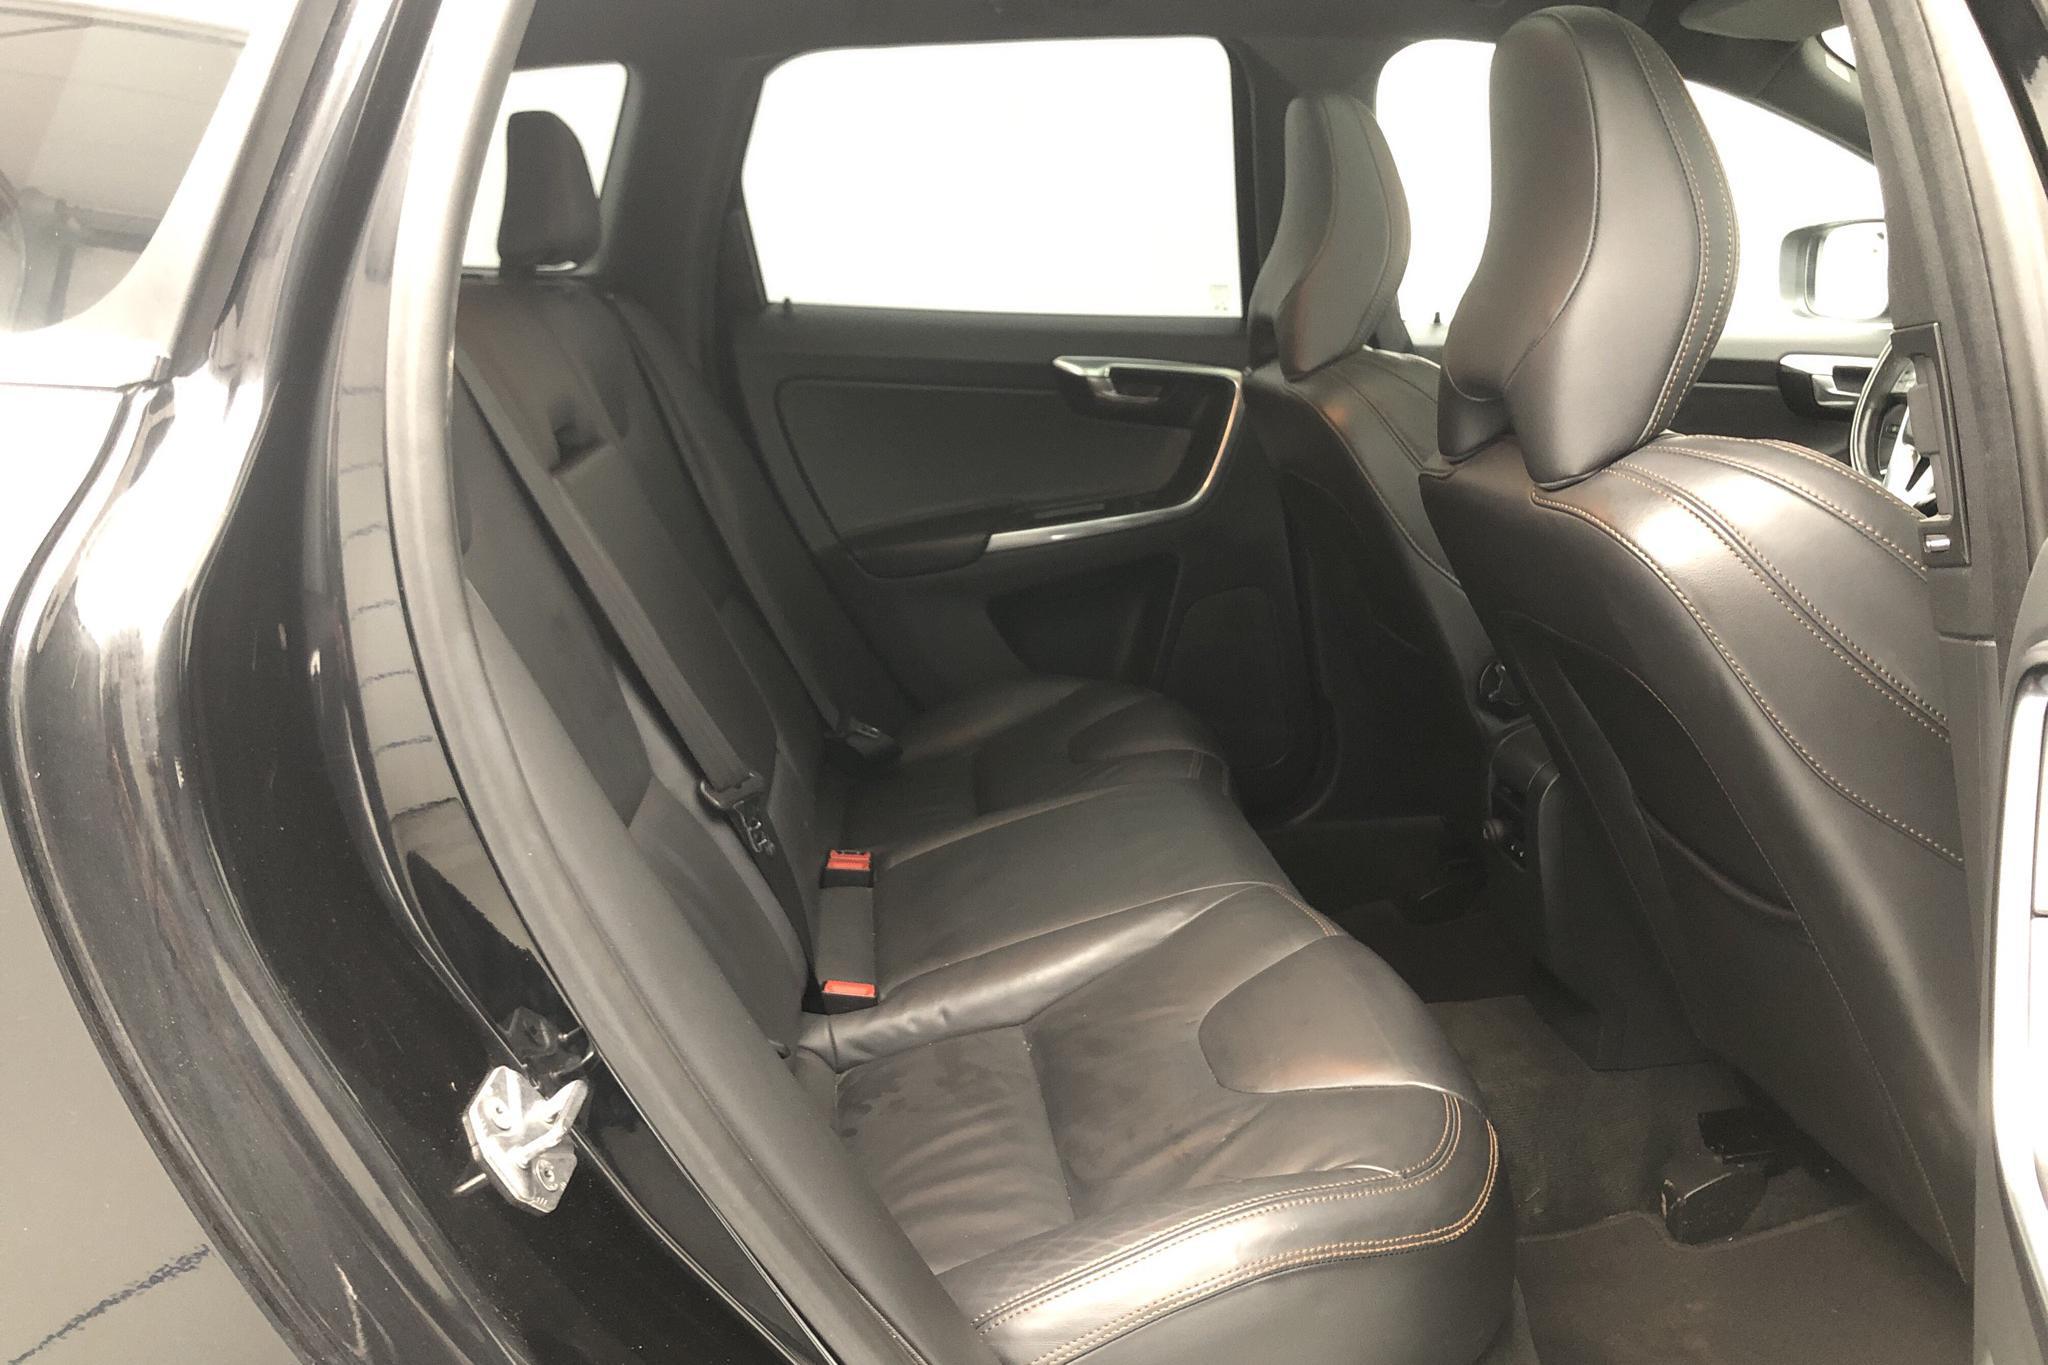 Volvo XC60 D4 AWD (181hk) - 9 077 mil - Automat - svart - 2014